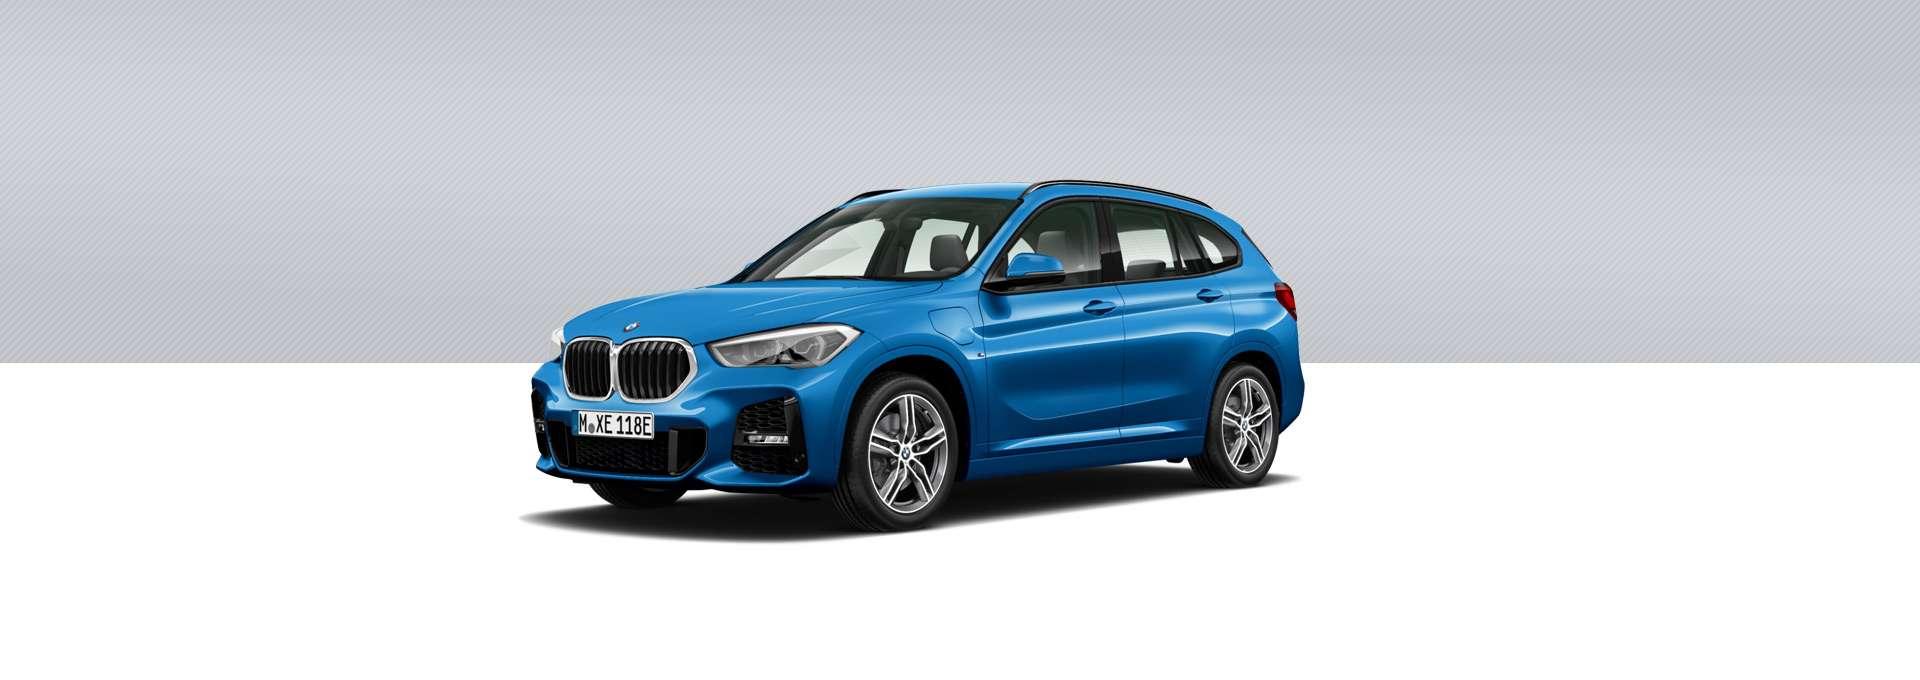 BMW Nuevo X1 Híbrido Enchufable